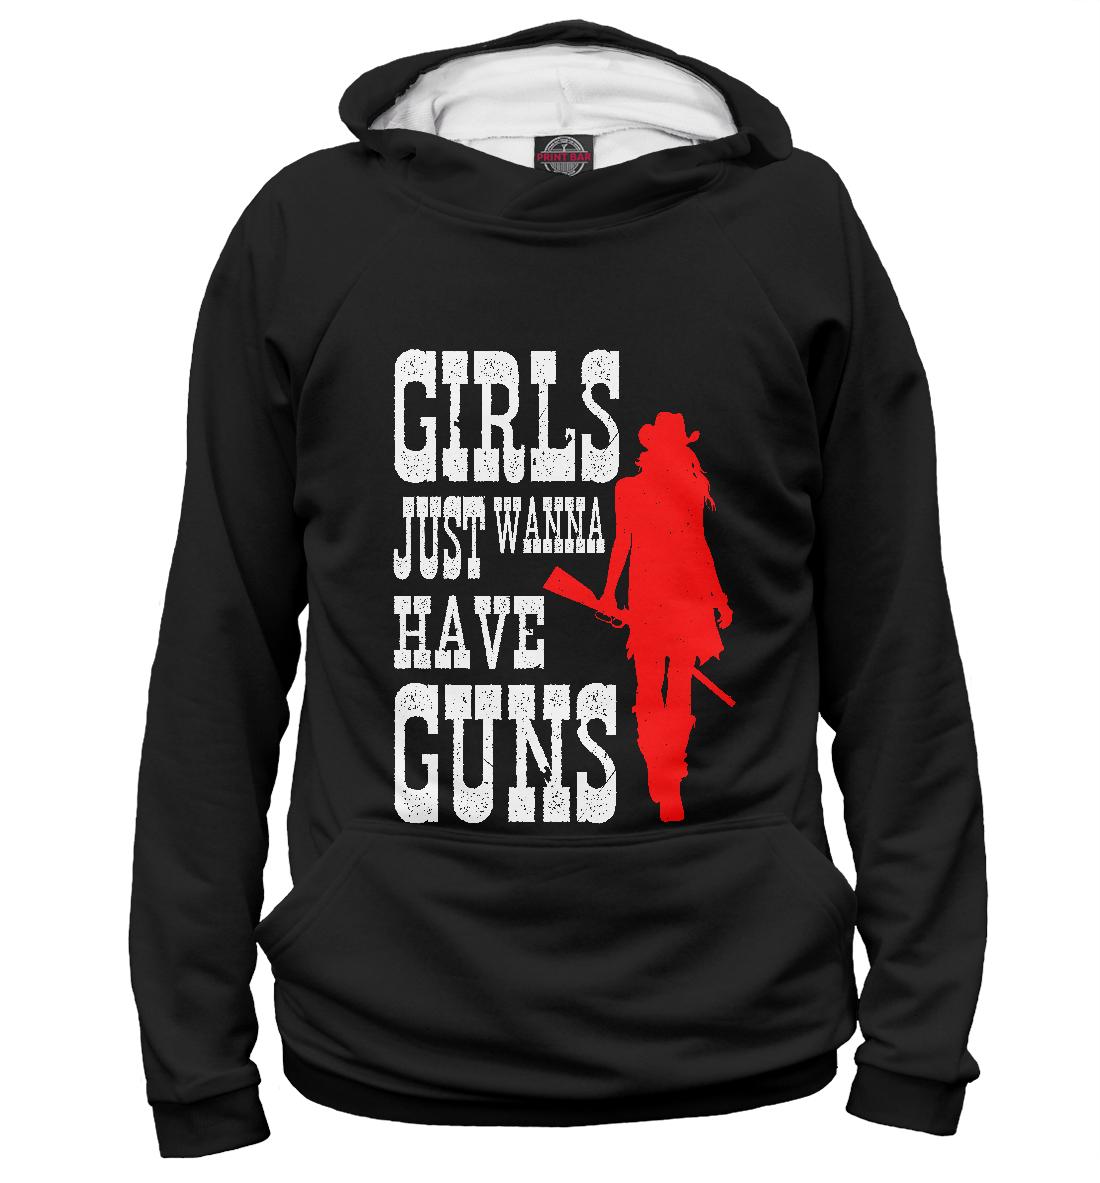 Купить Girls just wanna have guns, Printbar, Худи, DLR-451876-hud-2